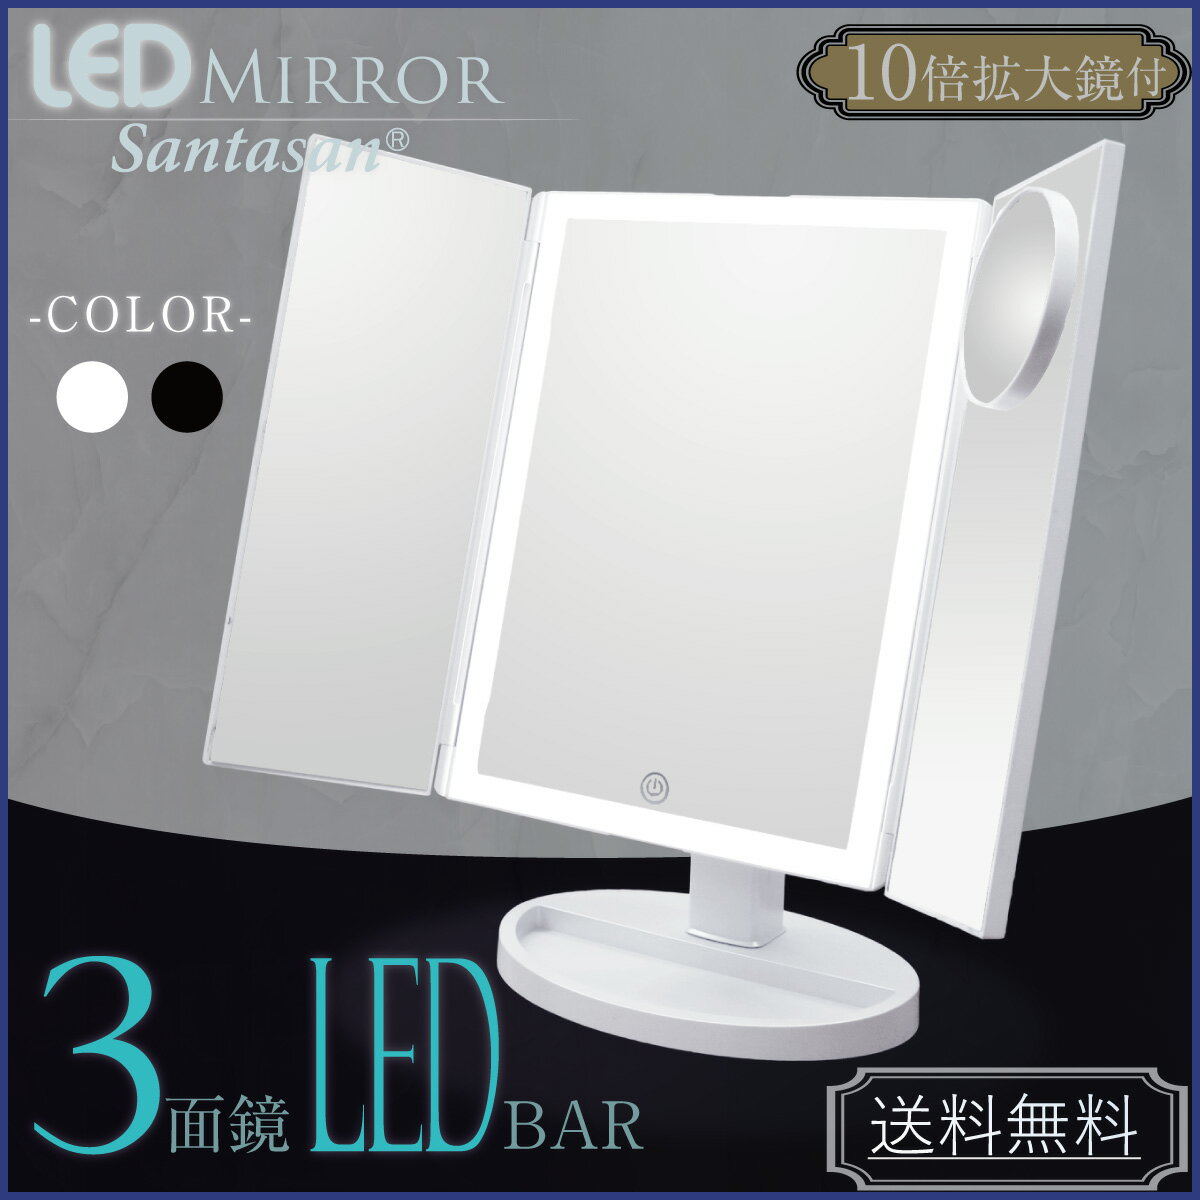 LEDミラー LEDバー 3面鏡 10倍拡大鏡付き 女優ミラー メイクミラー ブライトミラー 卓上ミラー スタンドミラー